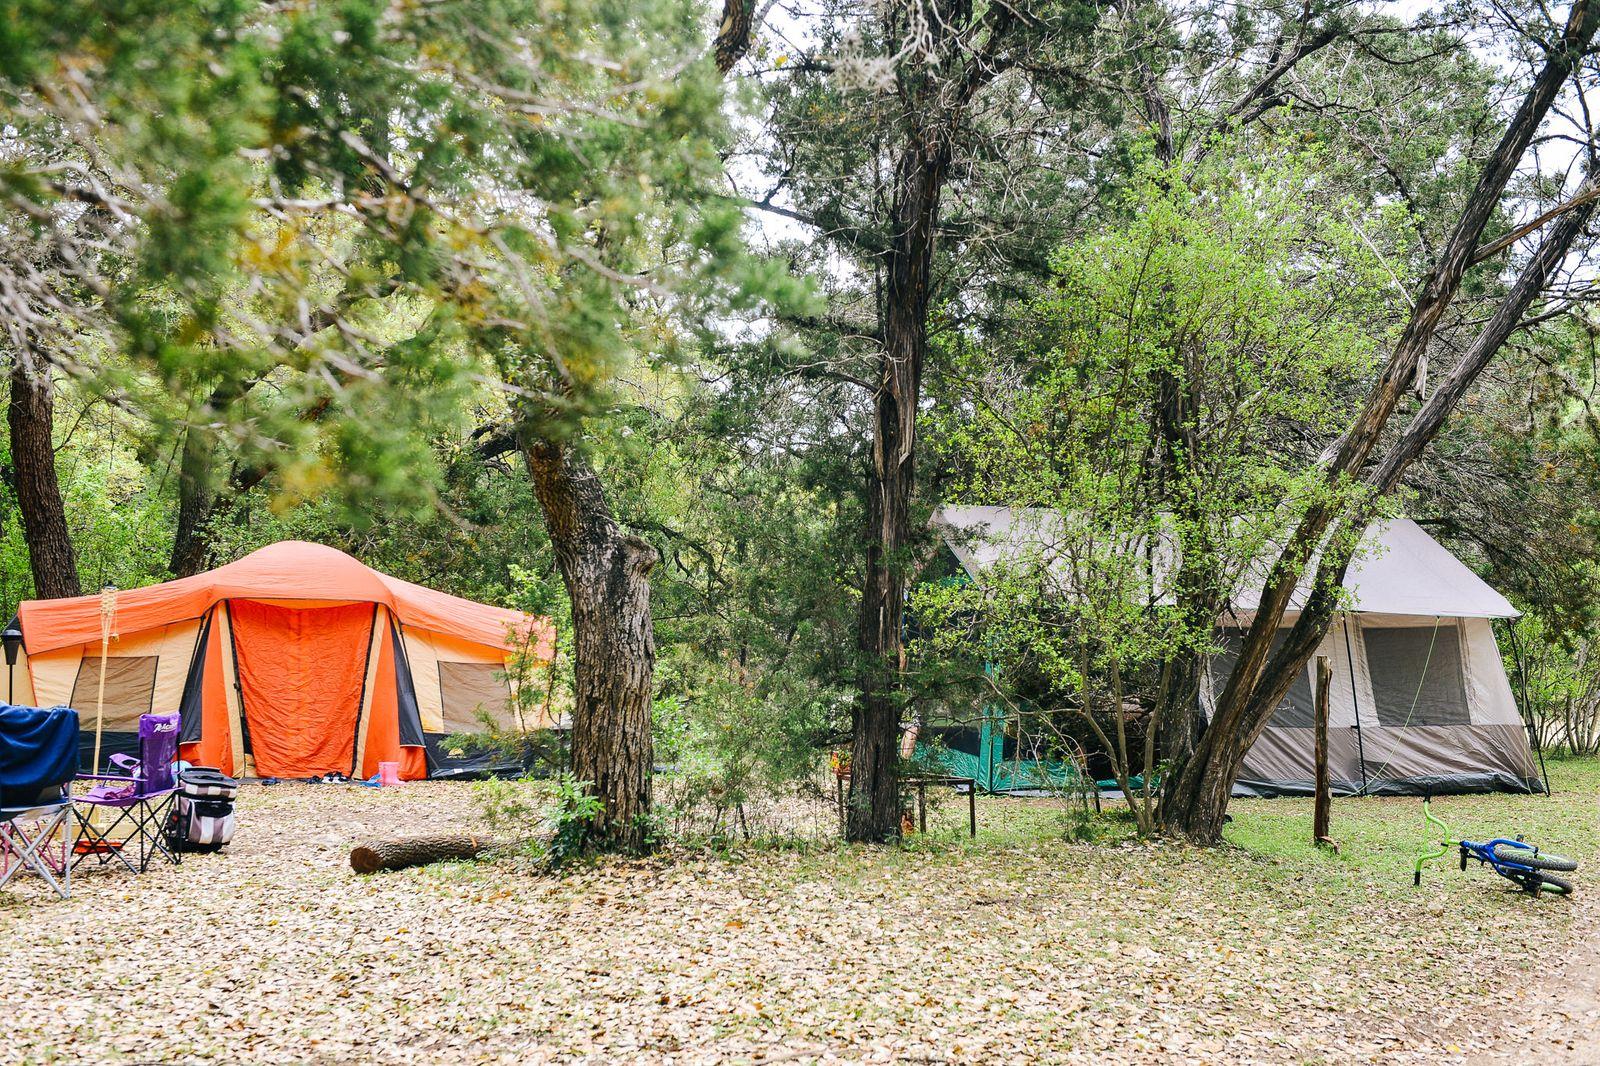 MQ Tent Camping Near Austin, Texas